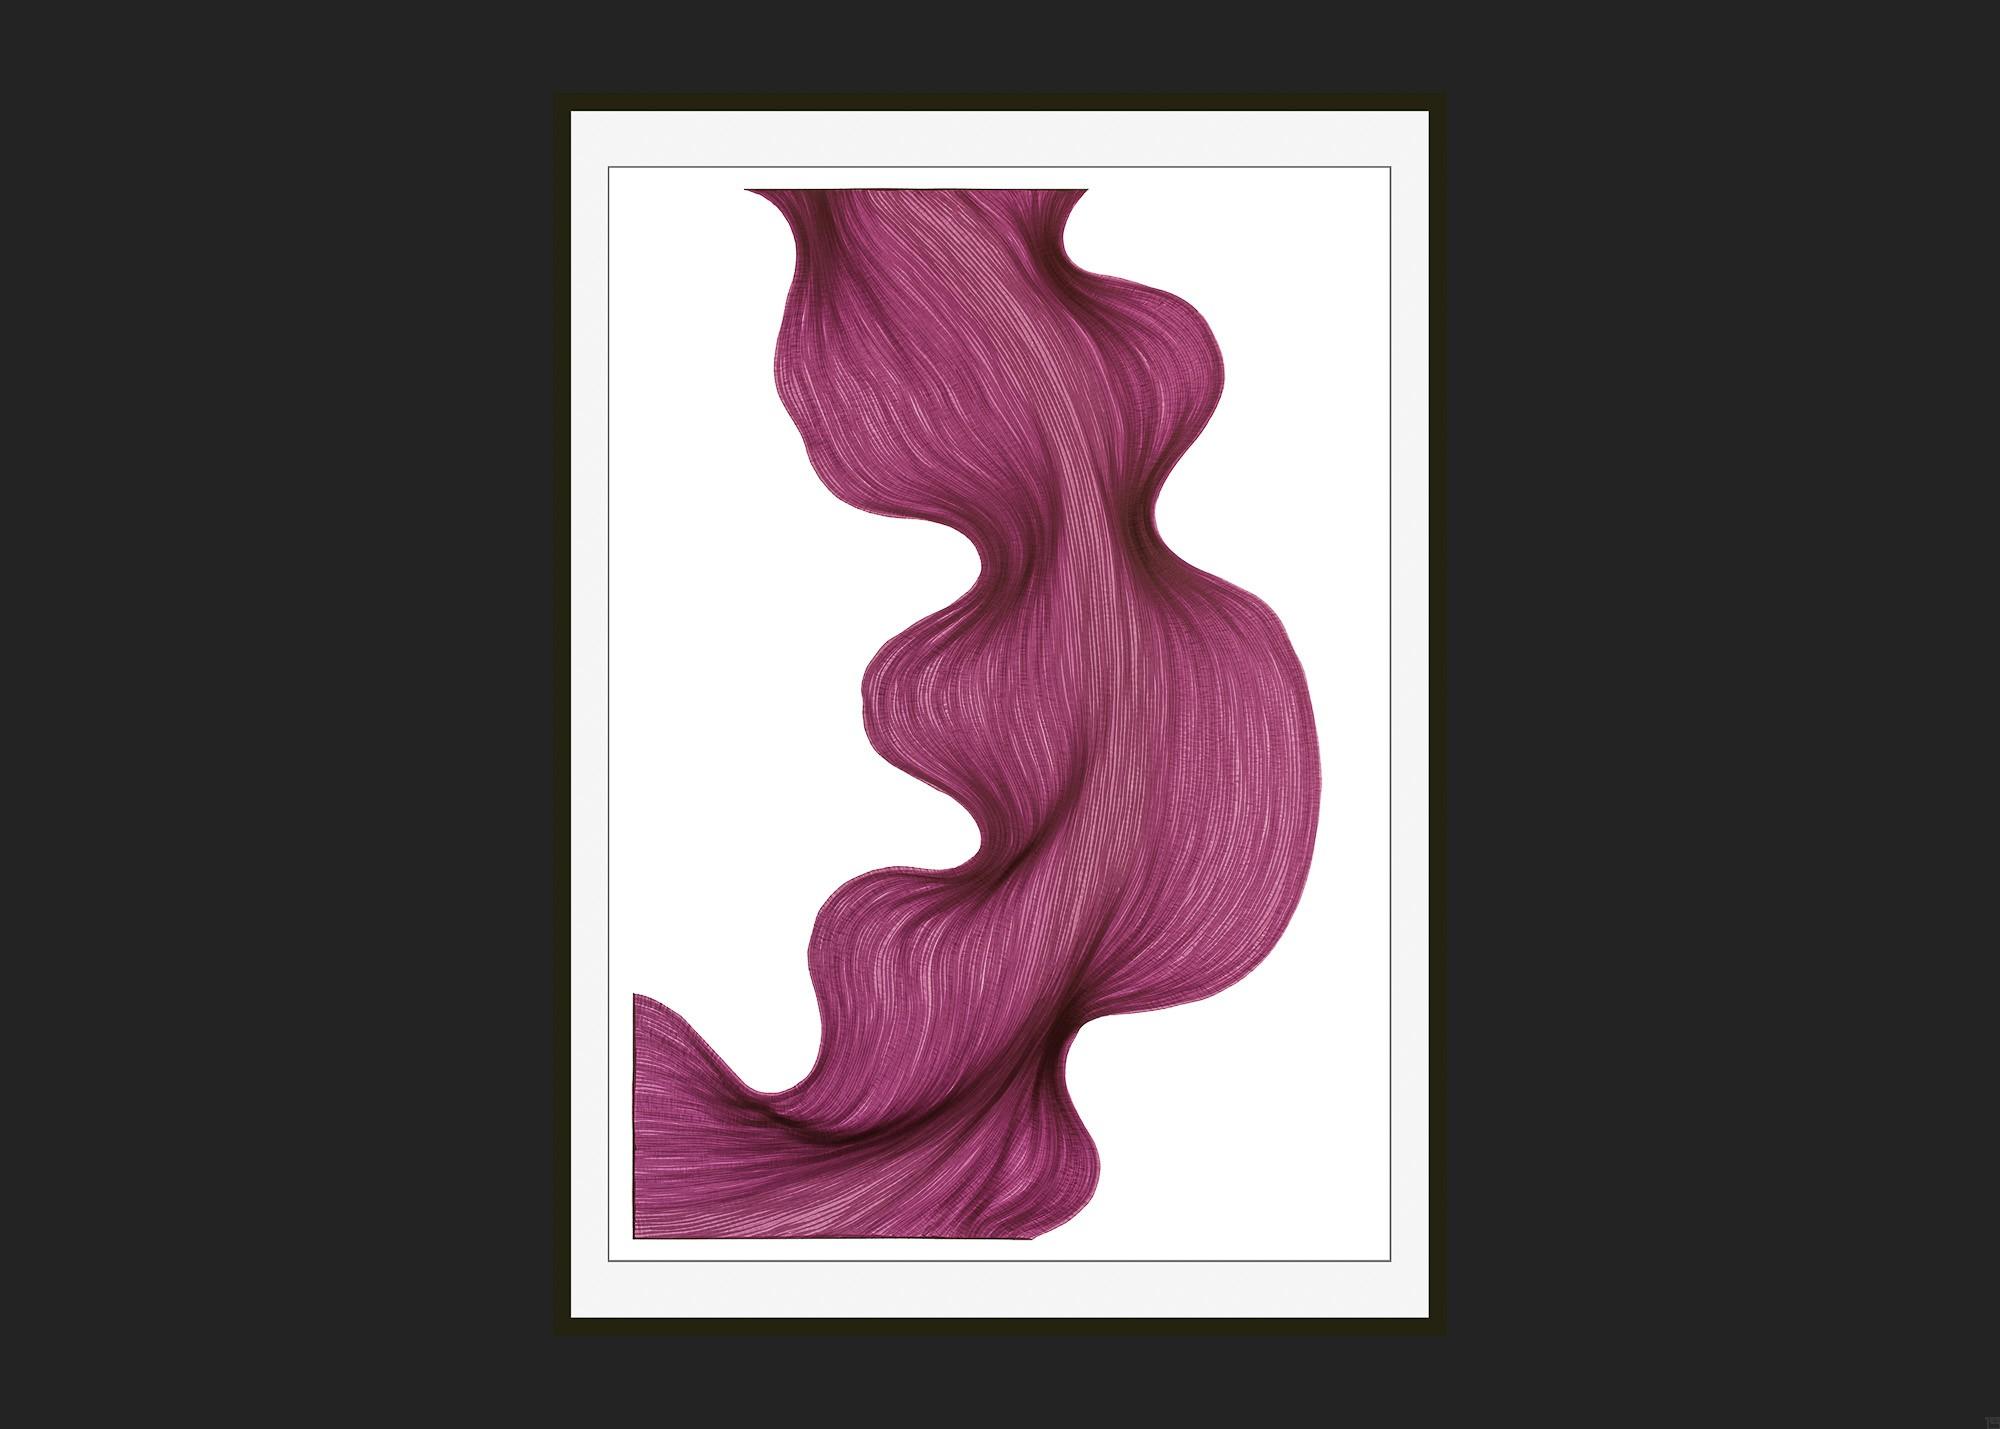 Bubbly Violet | Lali Torma | Zeichnung | Kalligraphie Tinte auf Papier - gerahmt